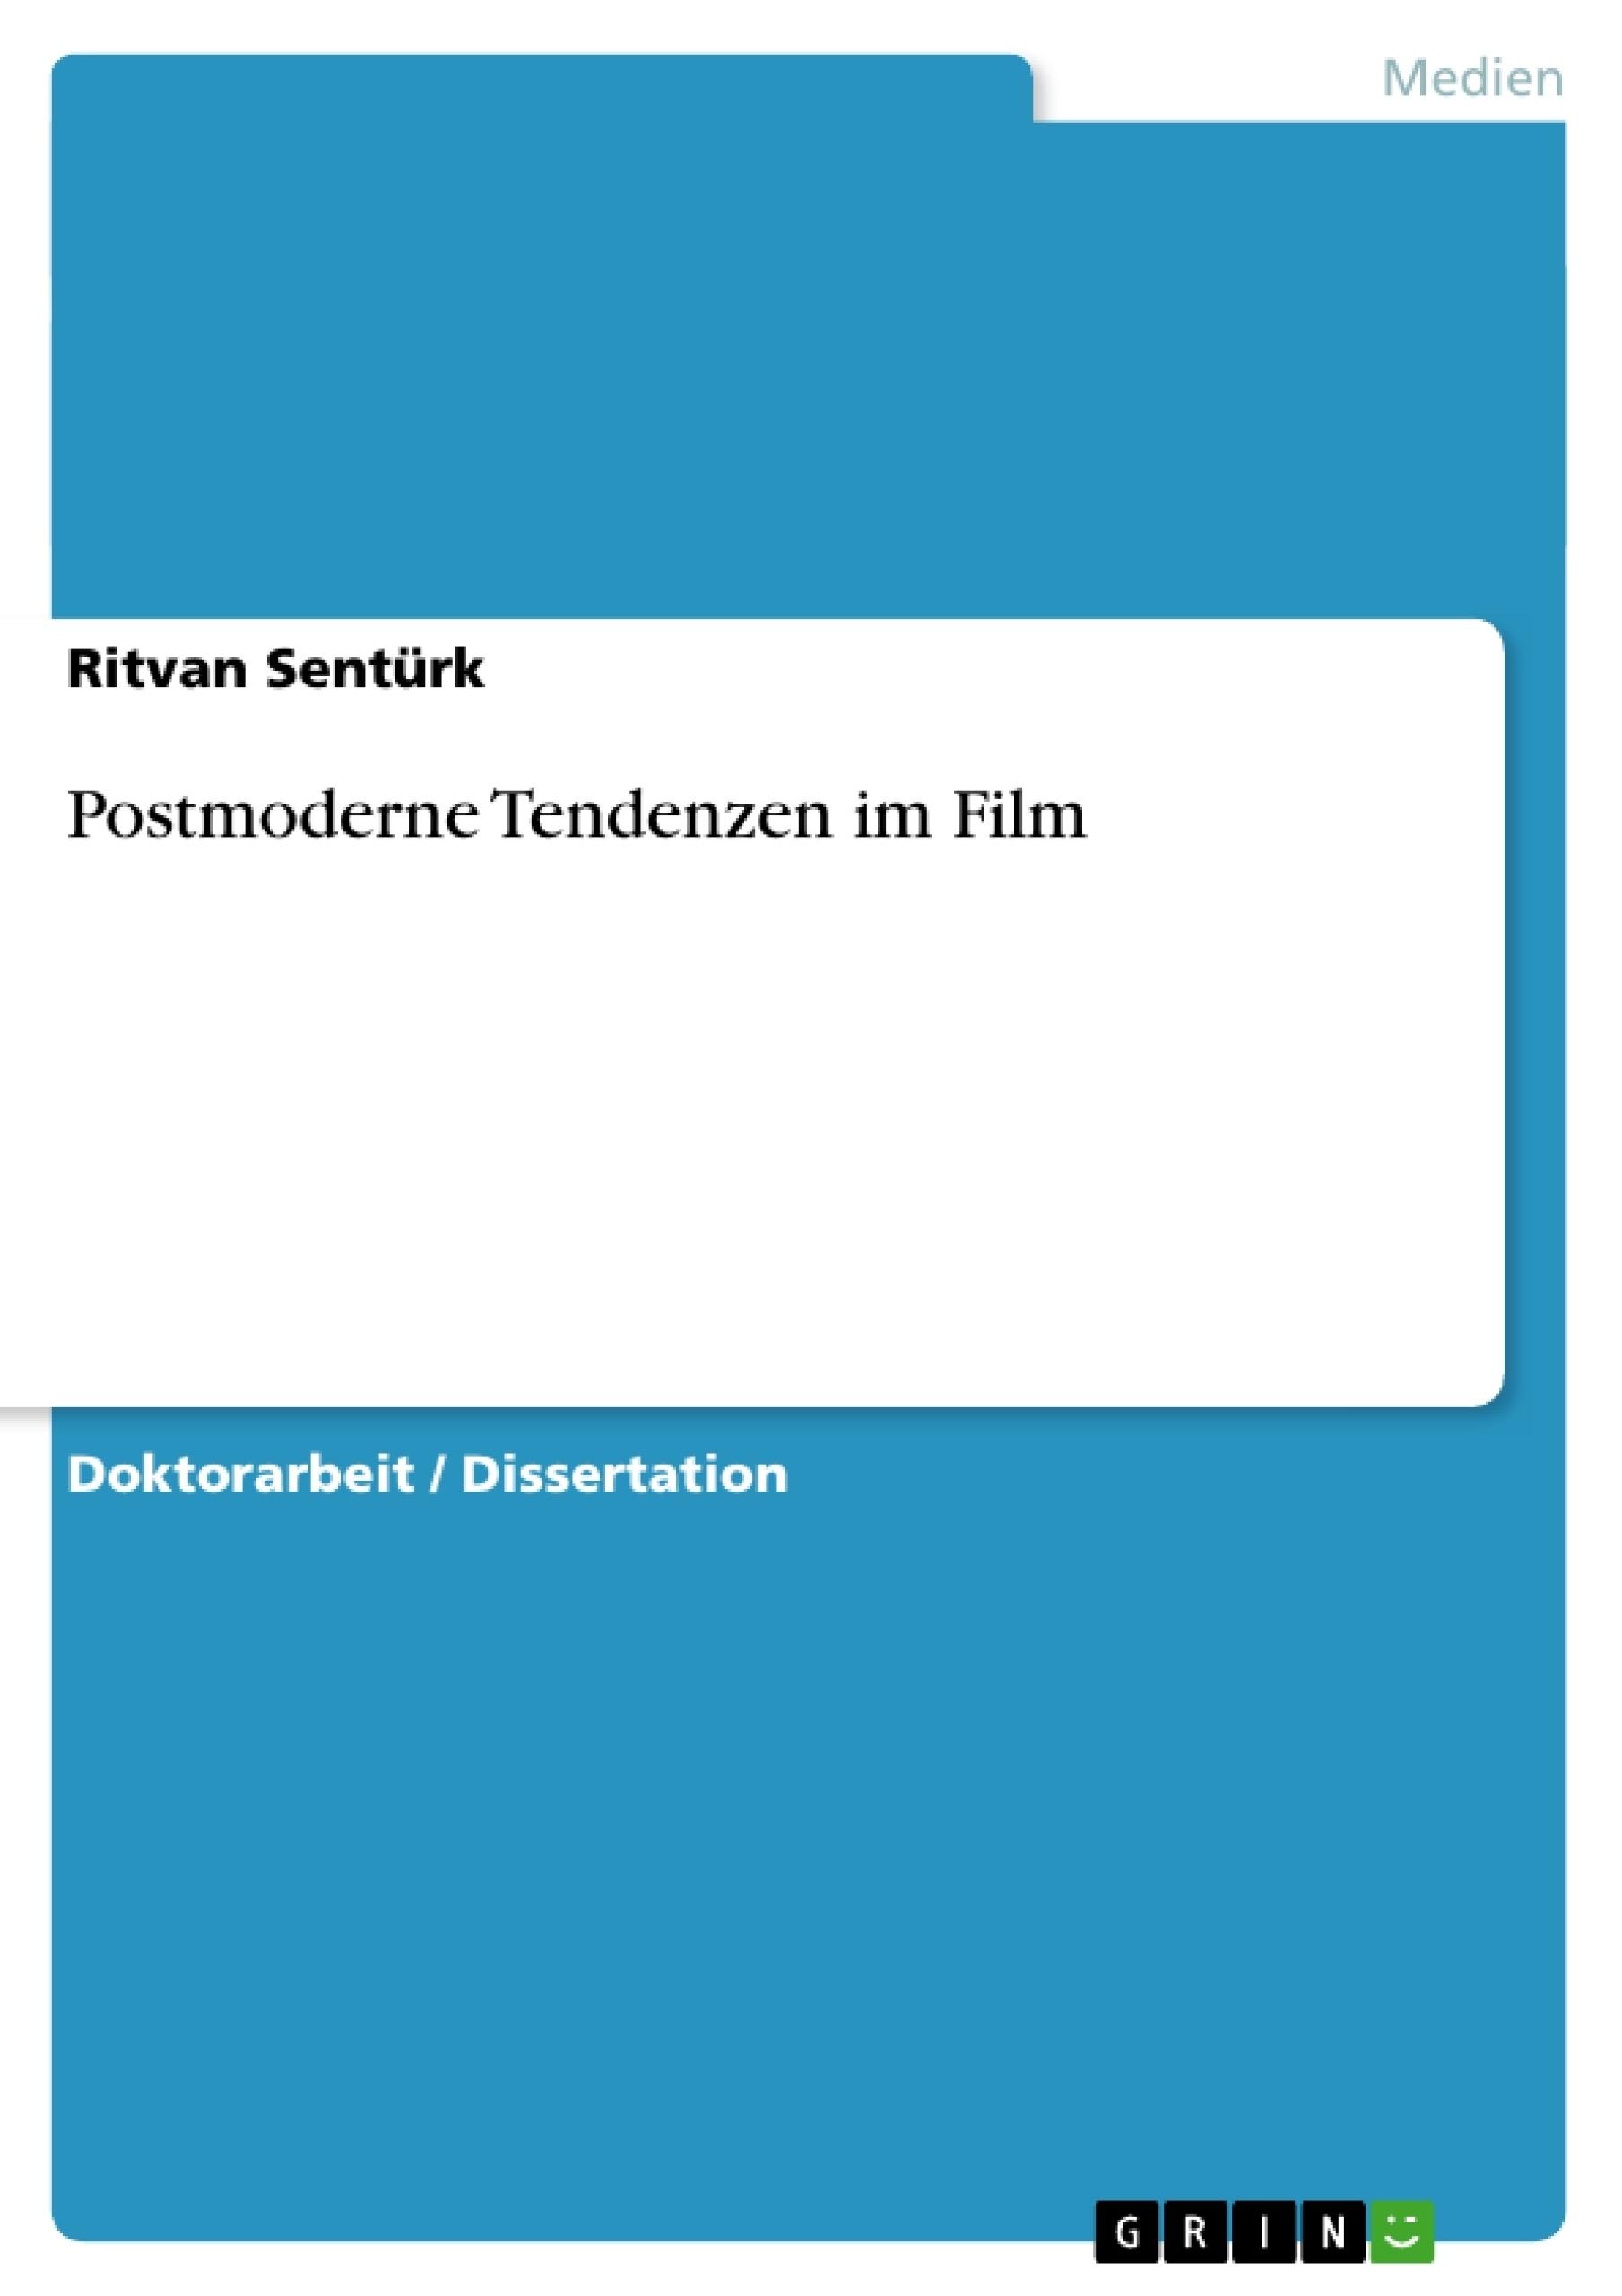 Titel: Postmoderne Tendenzen im Film